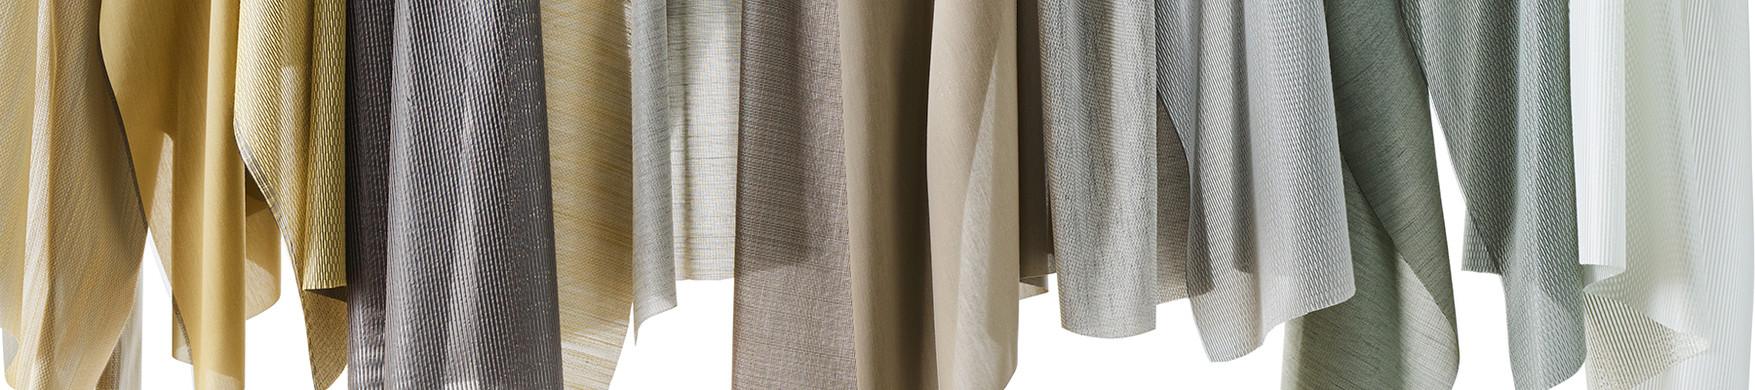 Carnegie-Fabrics-Acoustic-Drapery-Banner